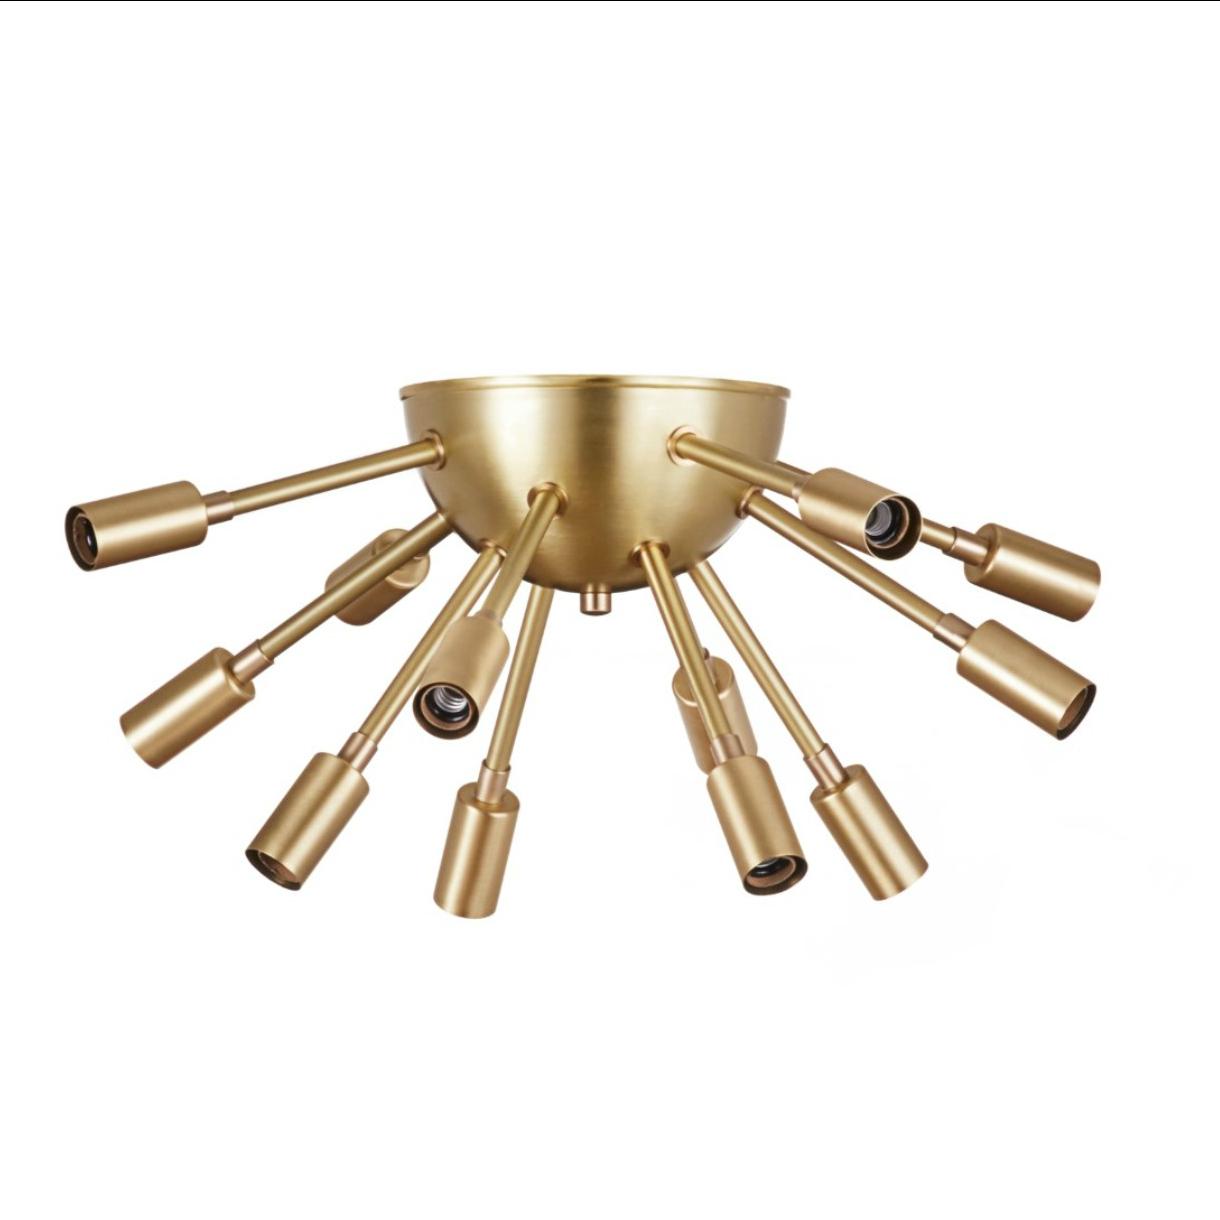 eclectic lighting. Brass Flushmount Sputnik Light - We Love This Funky, Eclectic Lighting. It Would Make Lighting C